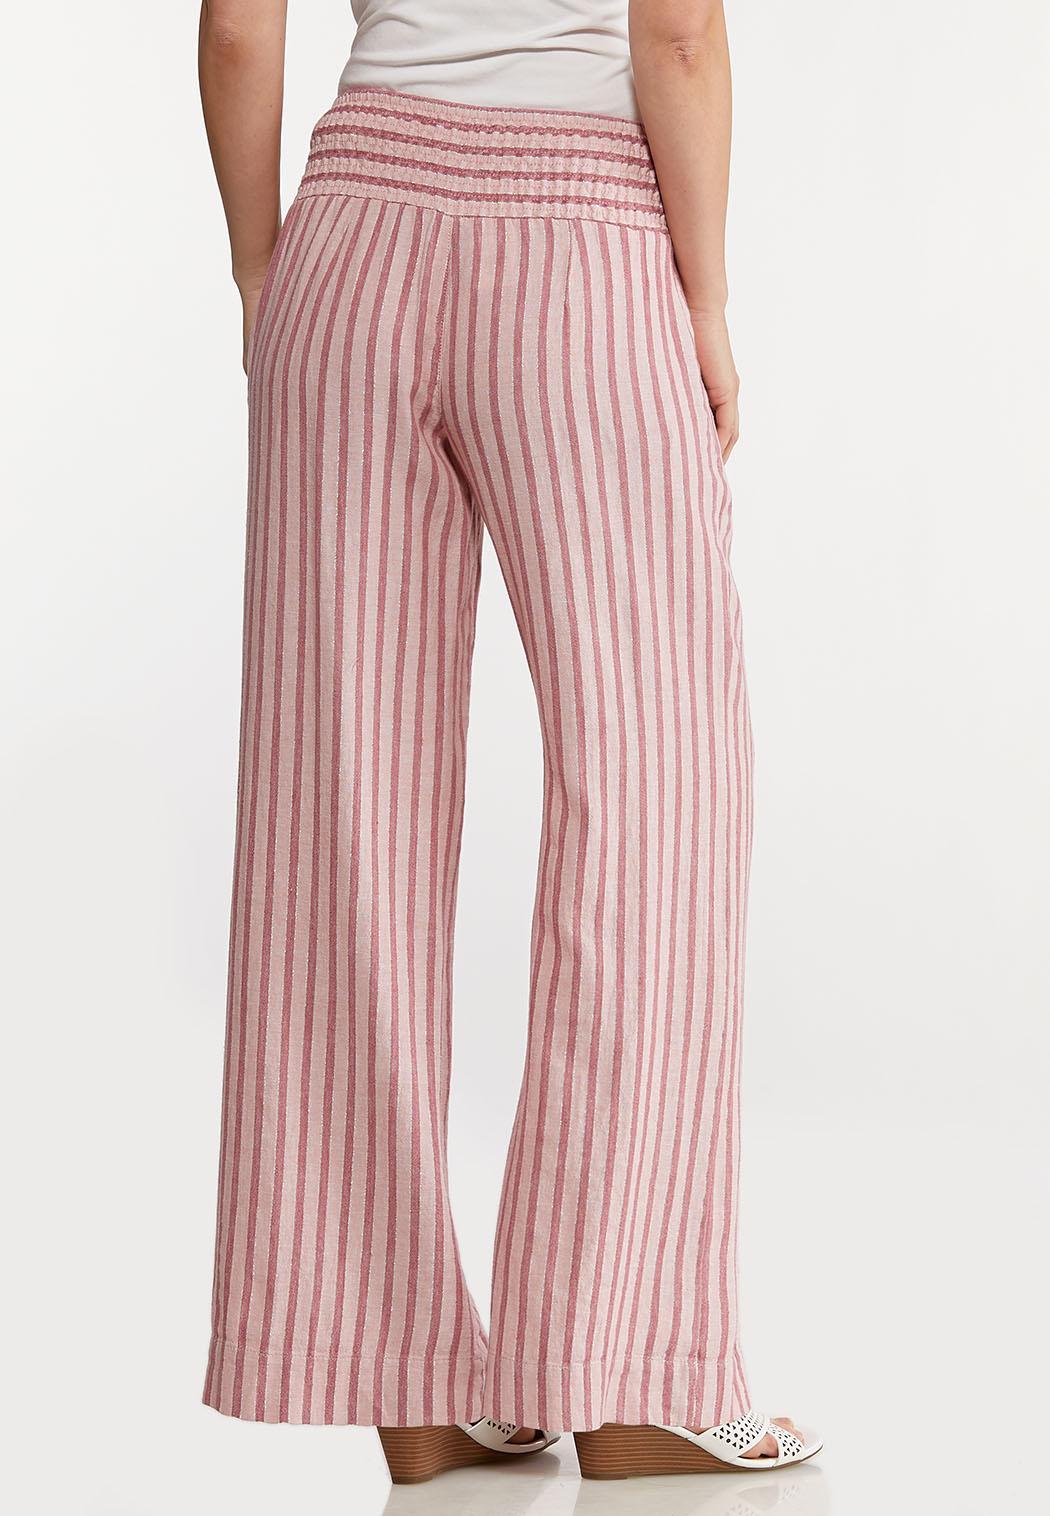 Cotton Candy Stripe Pants (Item #44173393)